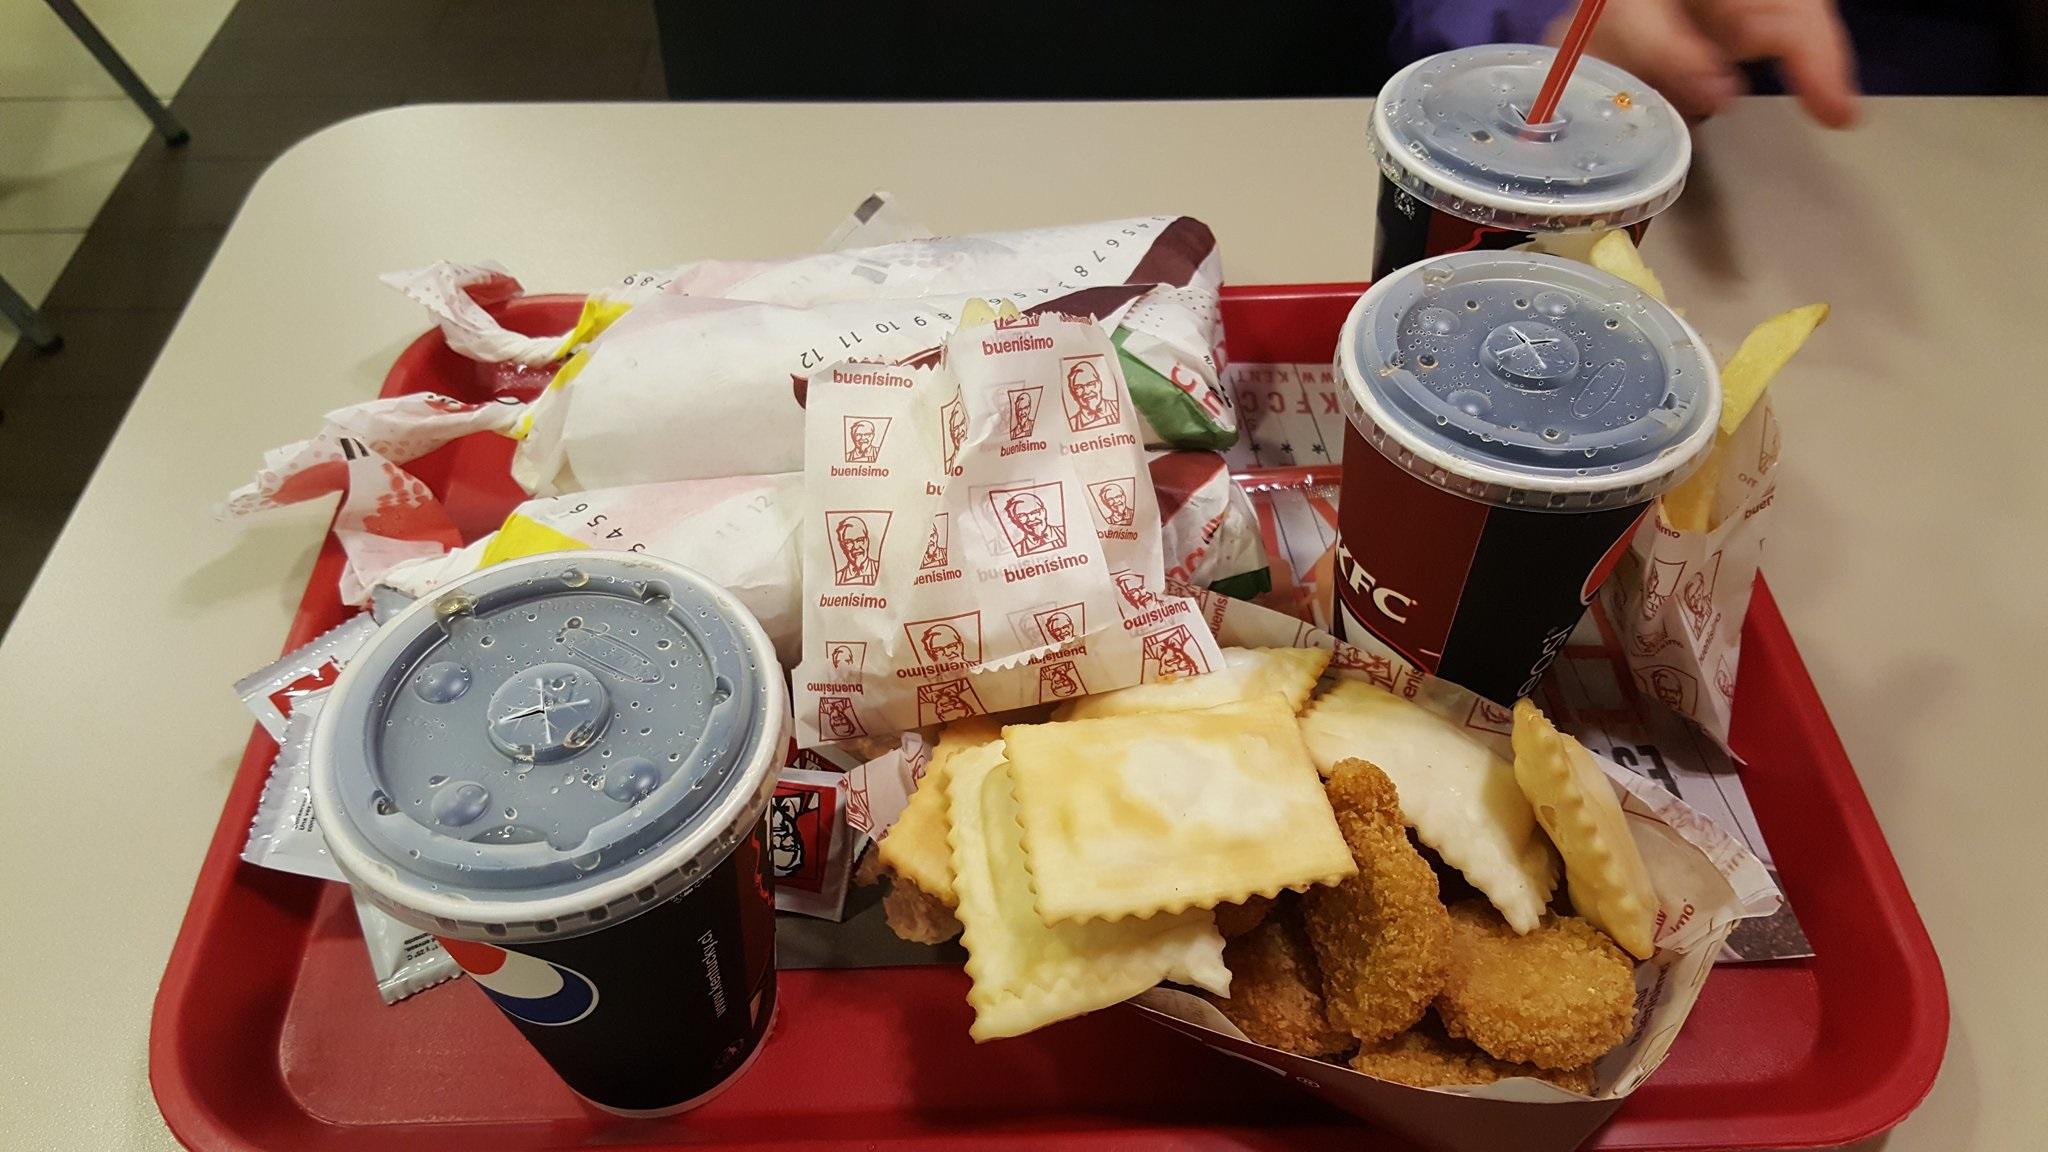 Eating KFC in South America